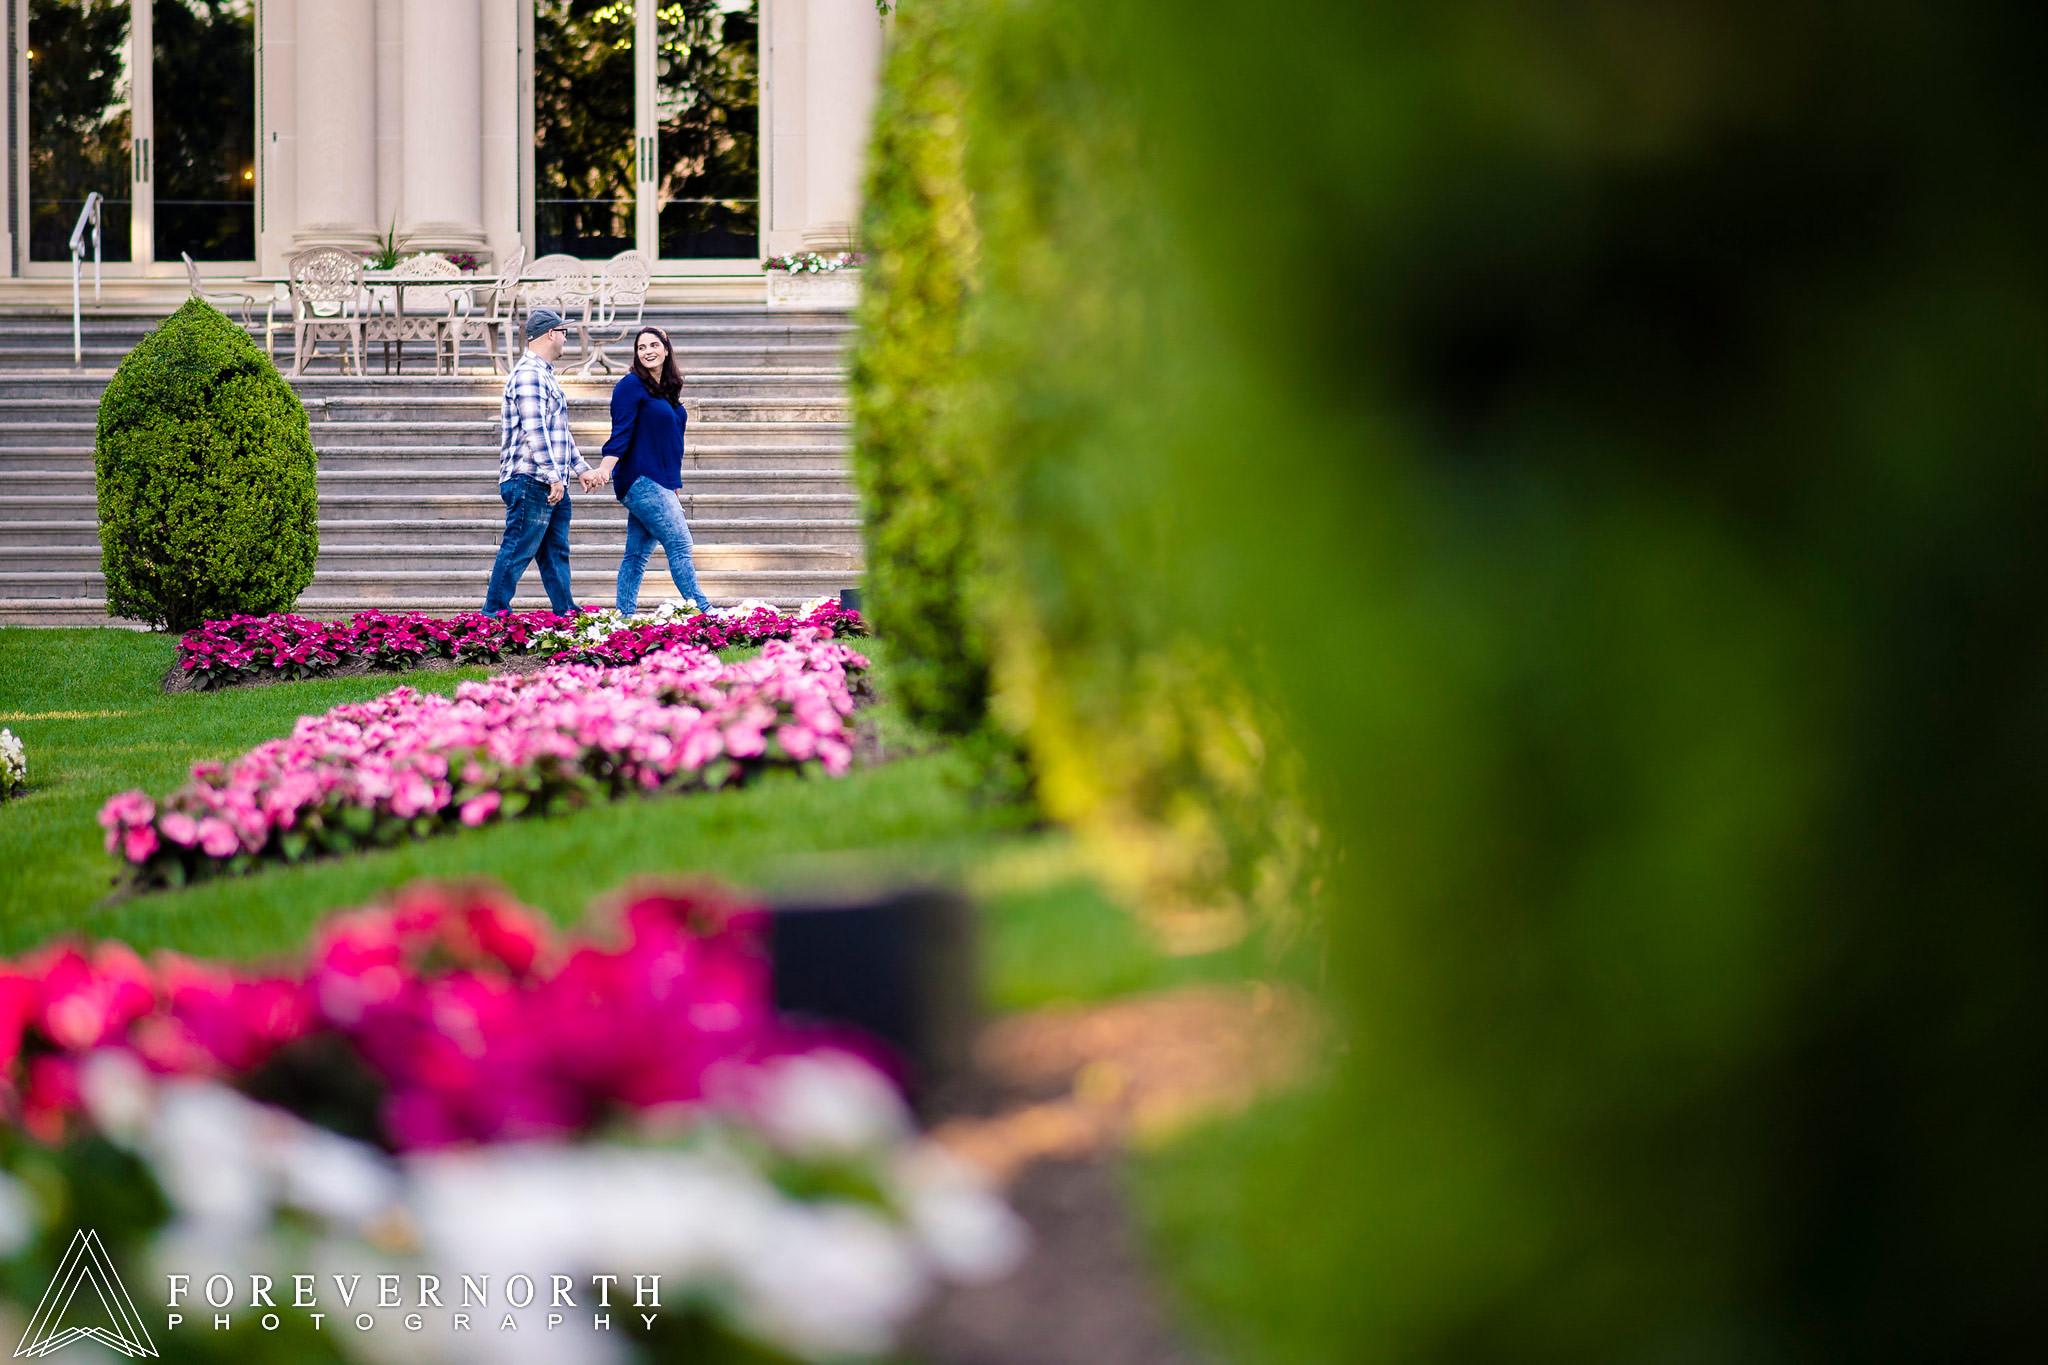 Brown-Monmouth-Gardens-Engagement-Photos04.JPG